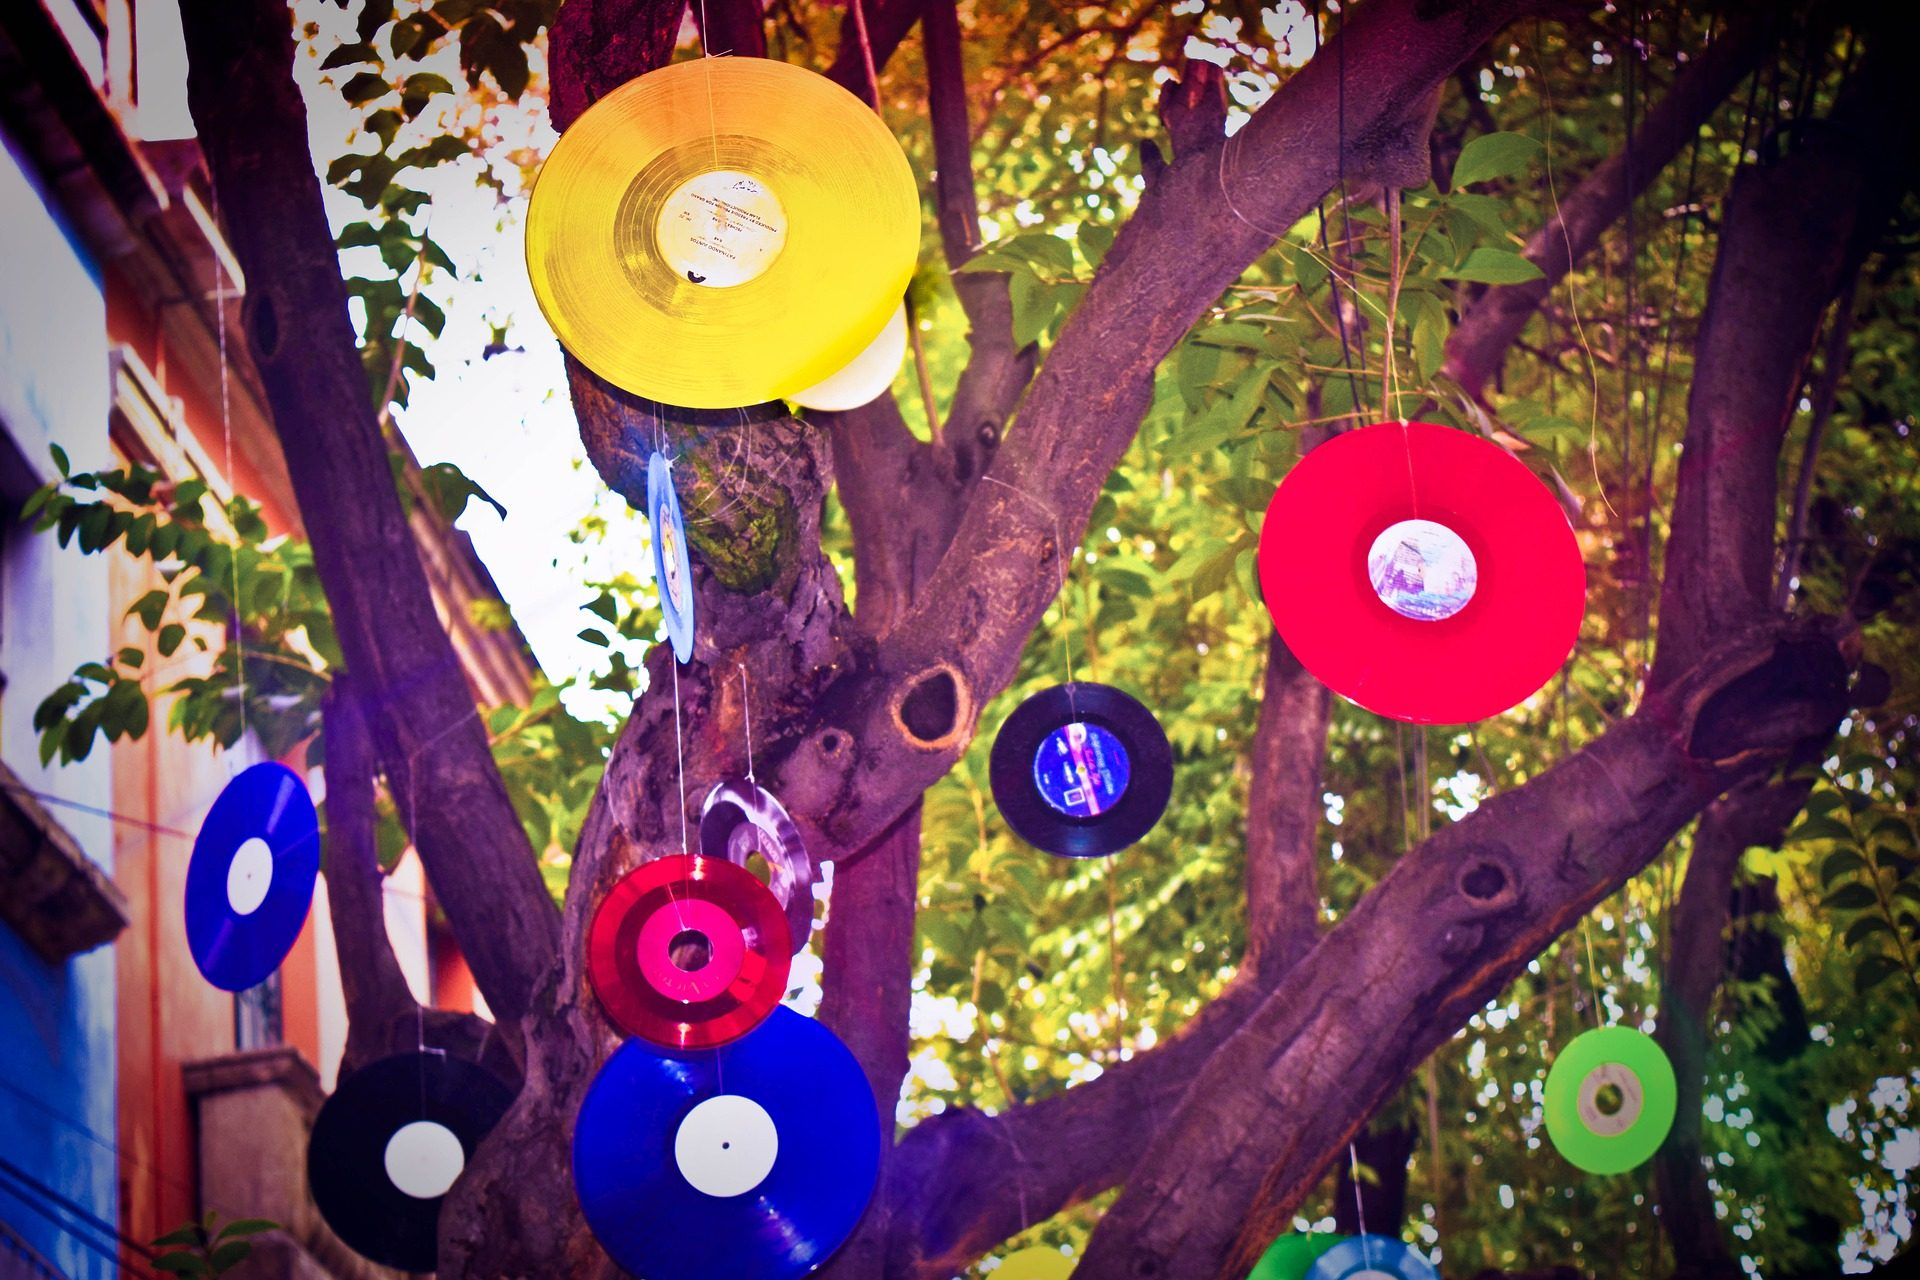 arbre, branches, disques, Vinyle, coloré - Fonds d'écran HD - Professor-falken.com